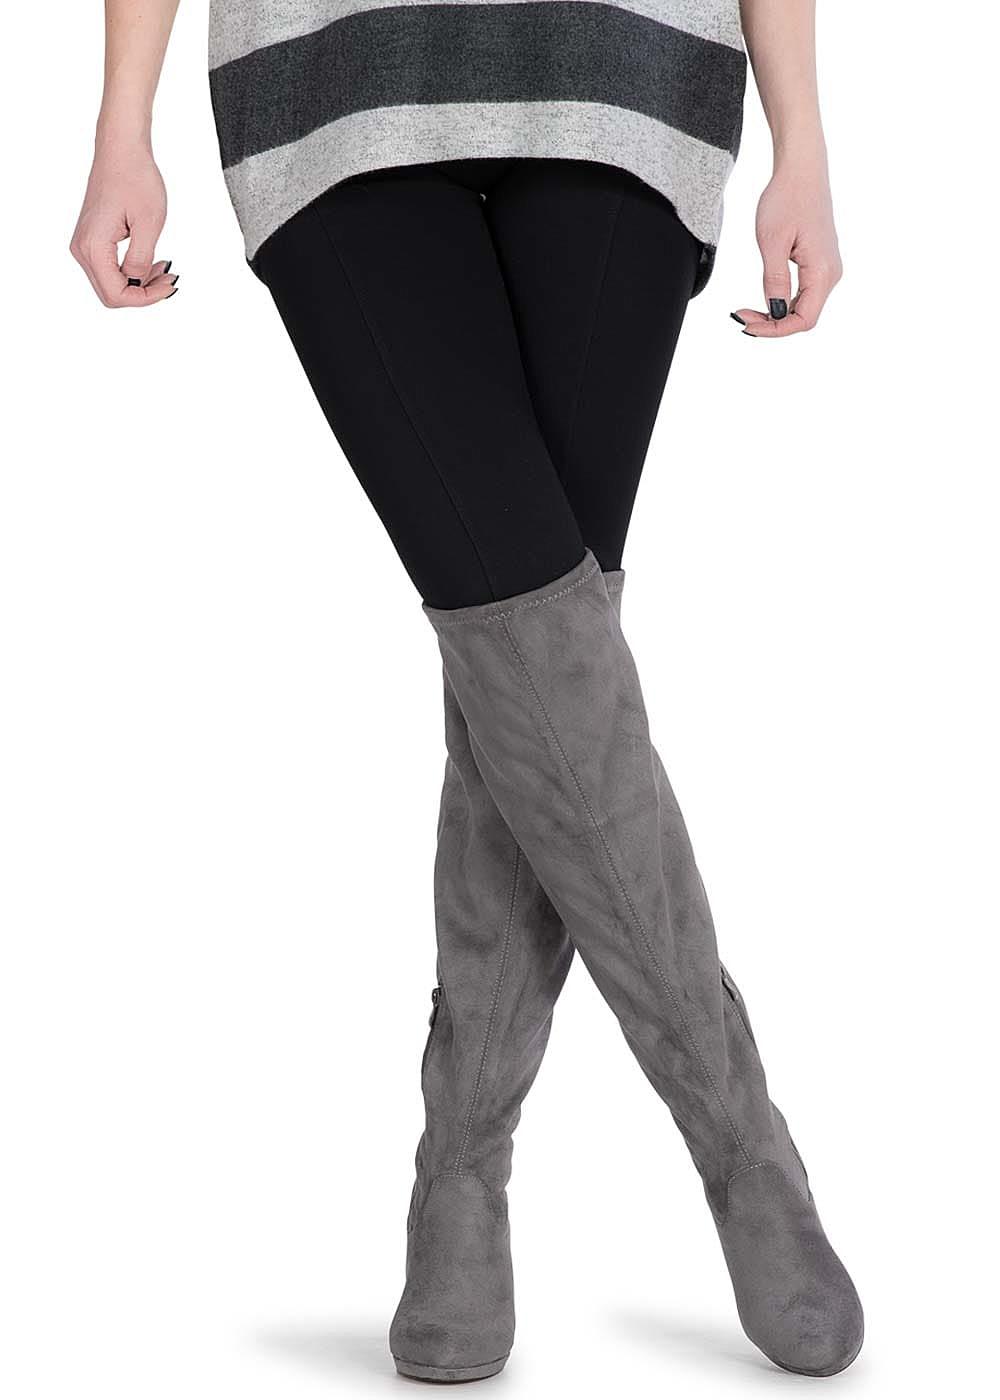 seventyseven lifestyle schuh overknee stiefel schmaler absatz 9cm zipper grau 77onlineshop. Black Bedroom Furniture Sets. Home Design Ideas